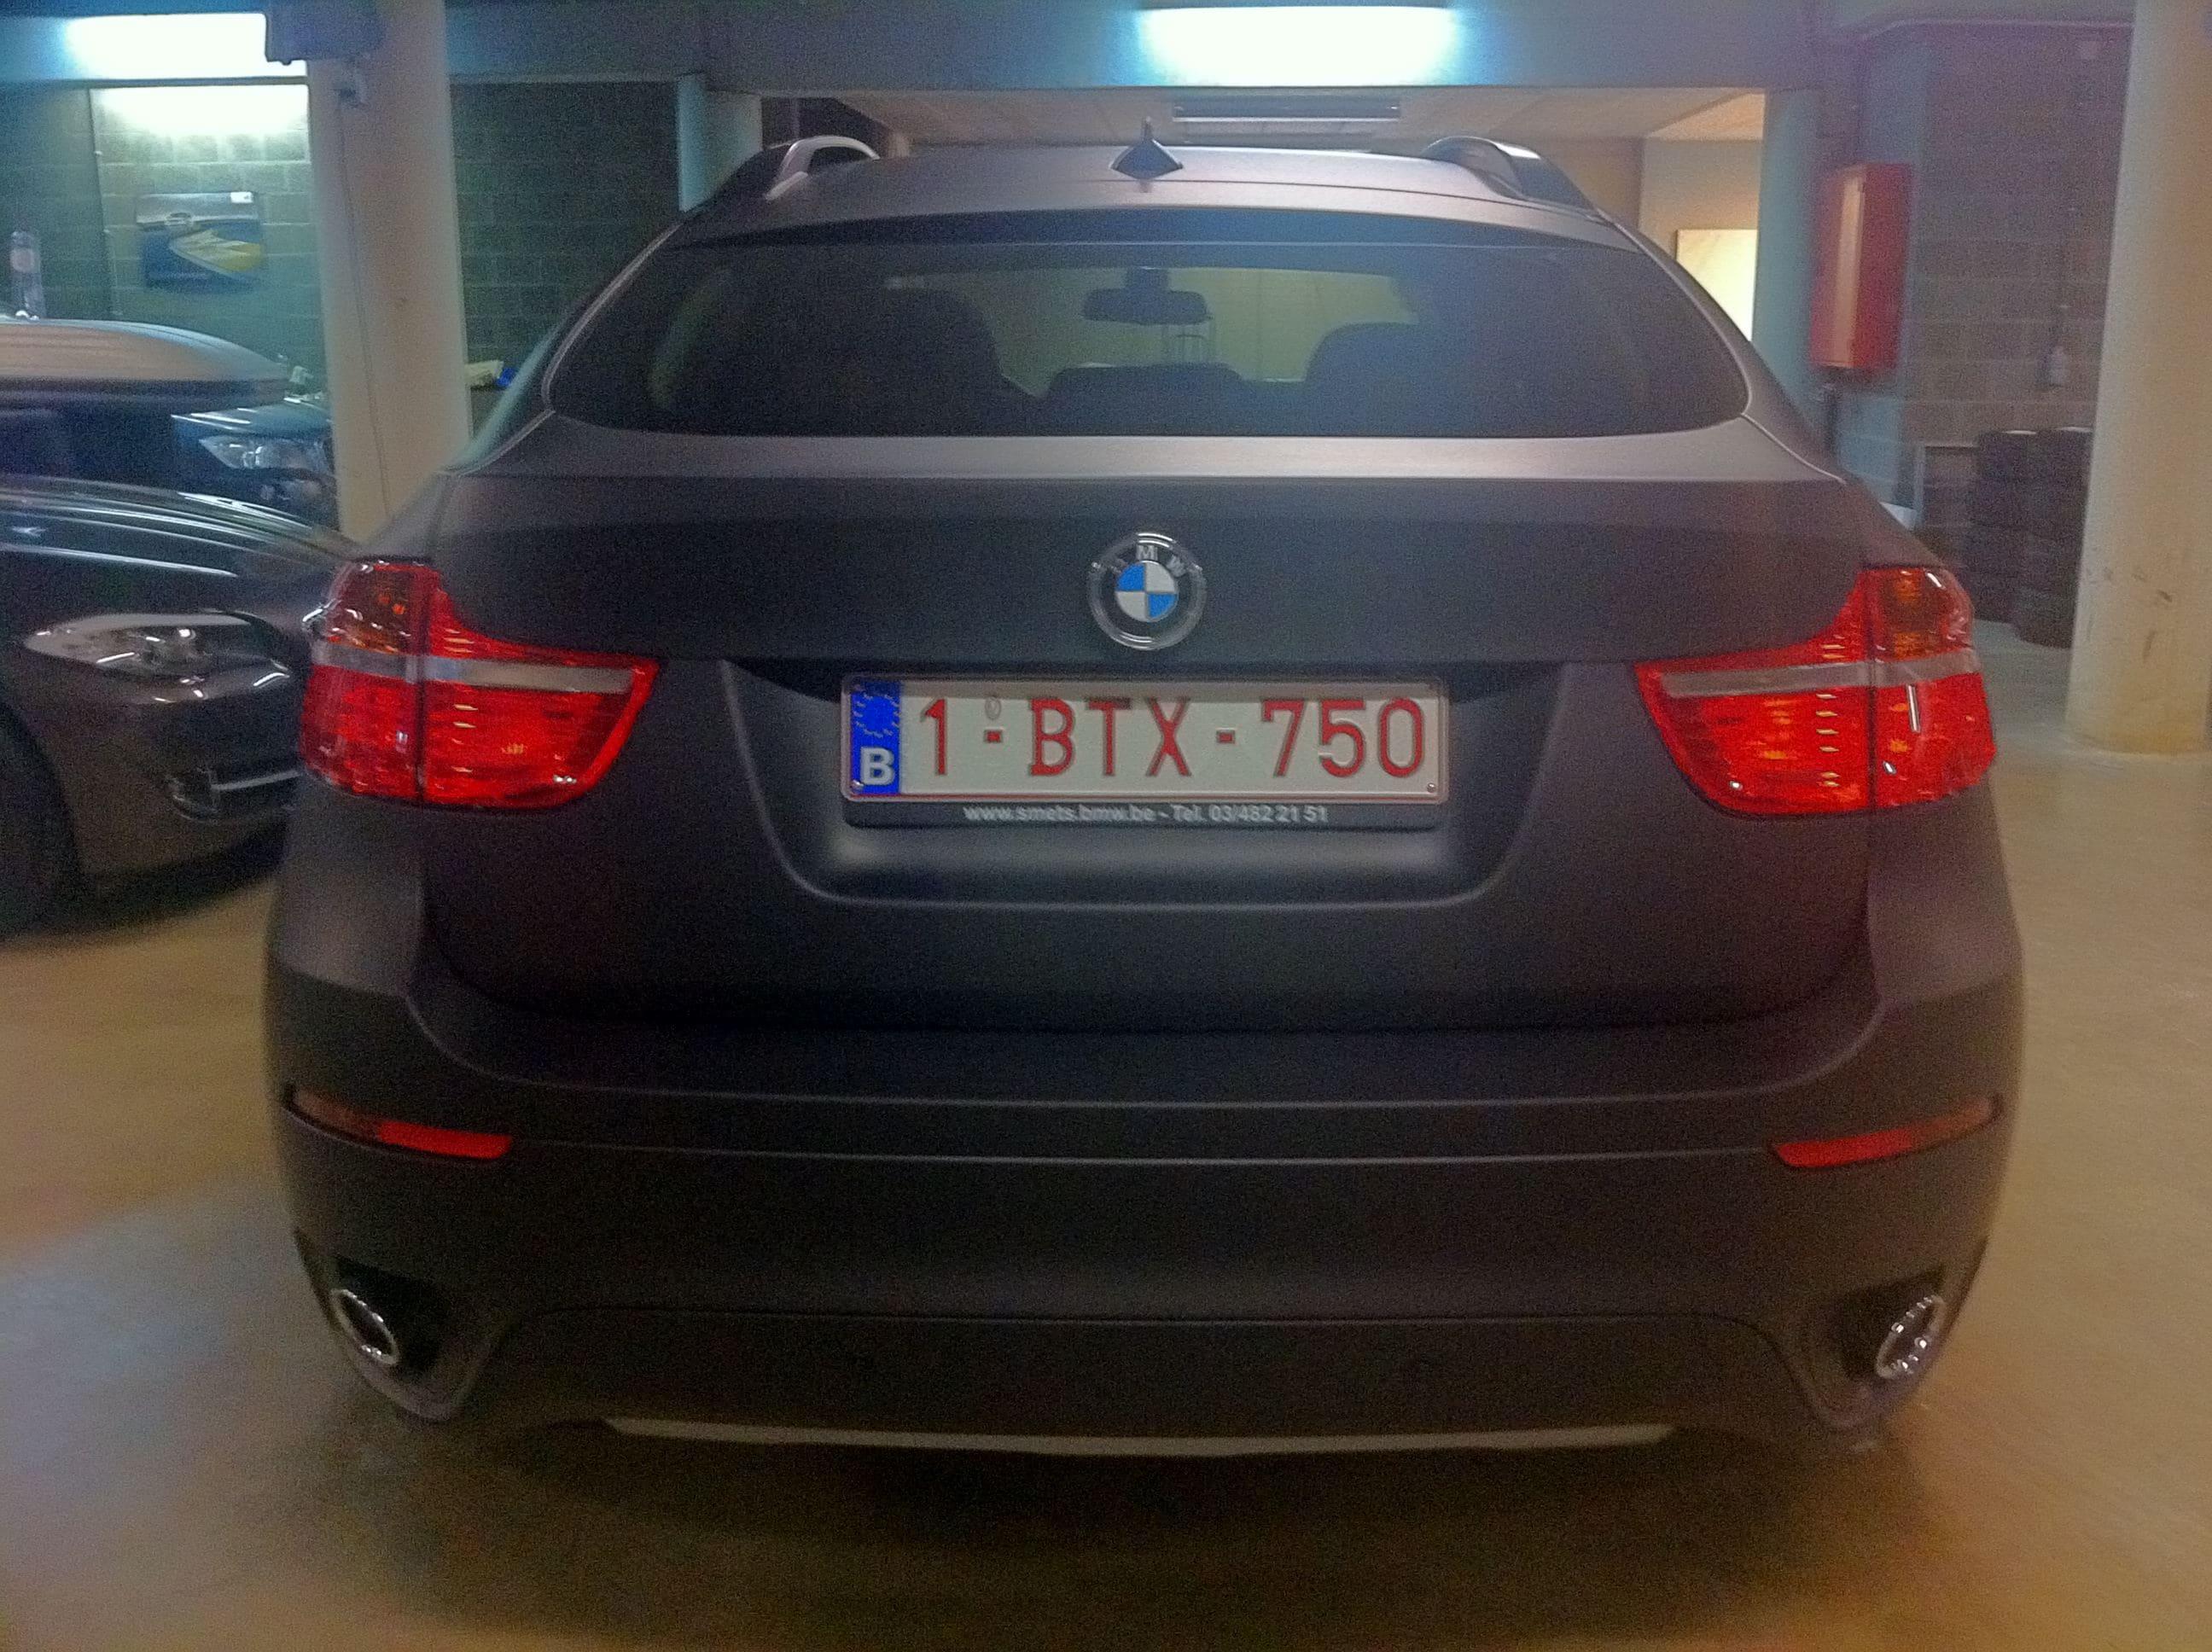 BMW X6 met Mat Zwarte Wrap, Carwrapping door Wrapmyride.nu Foto-nr:5487, ©2020